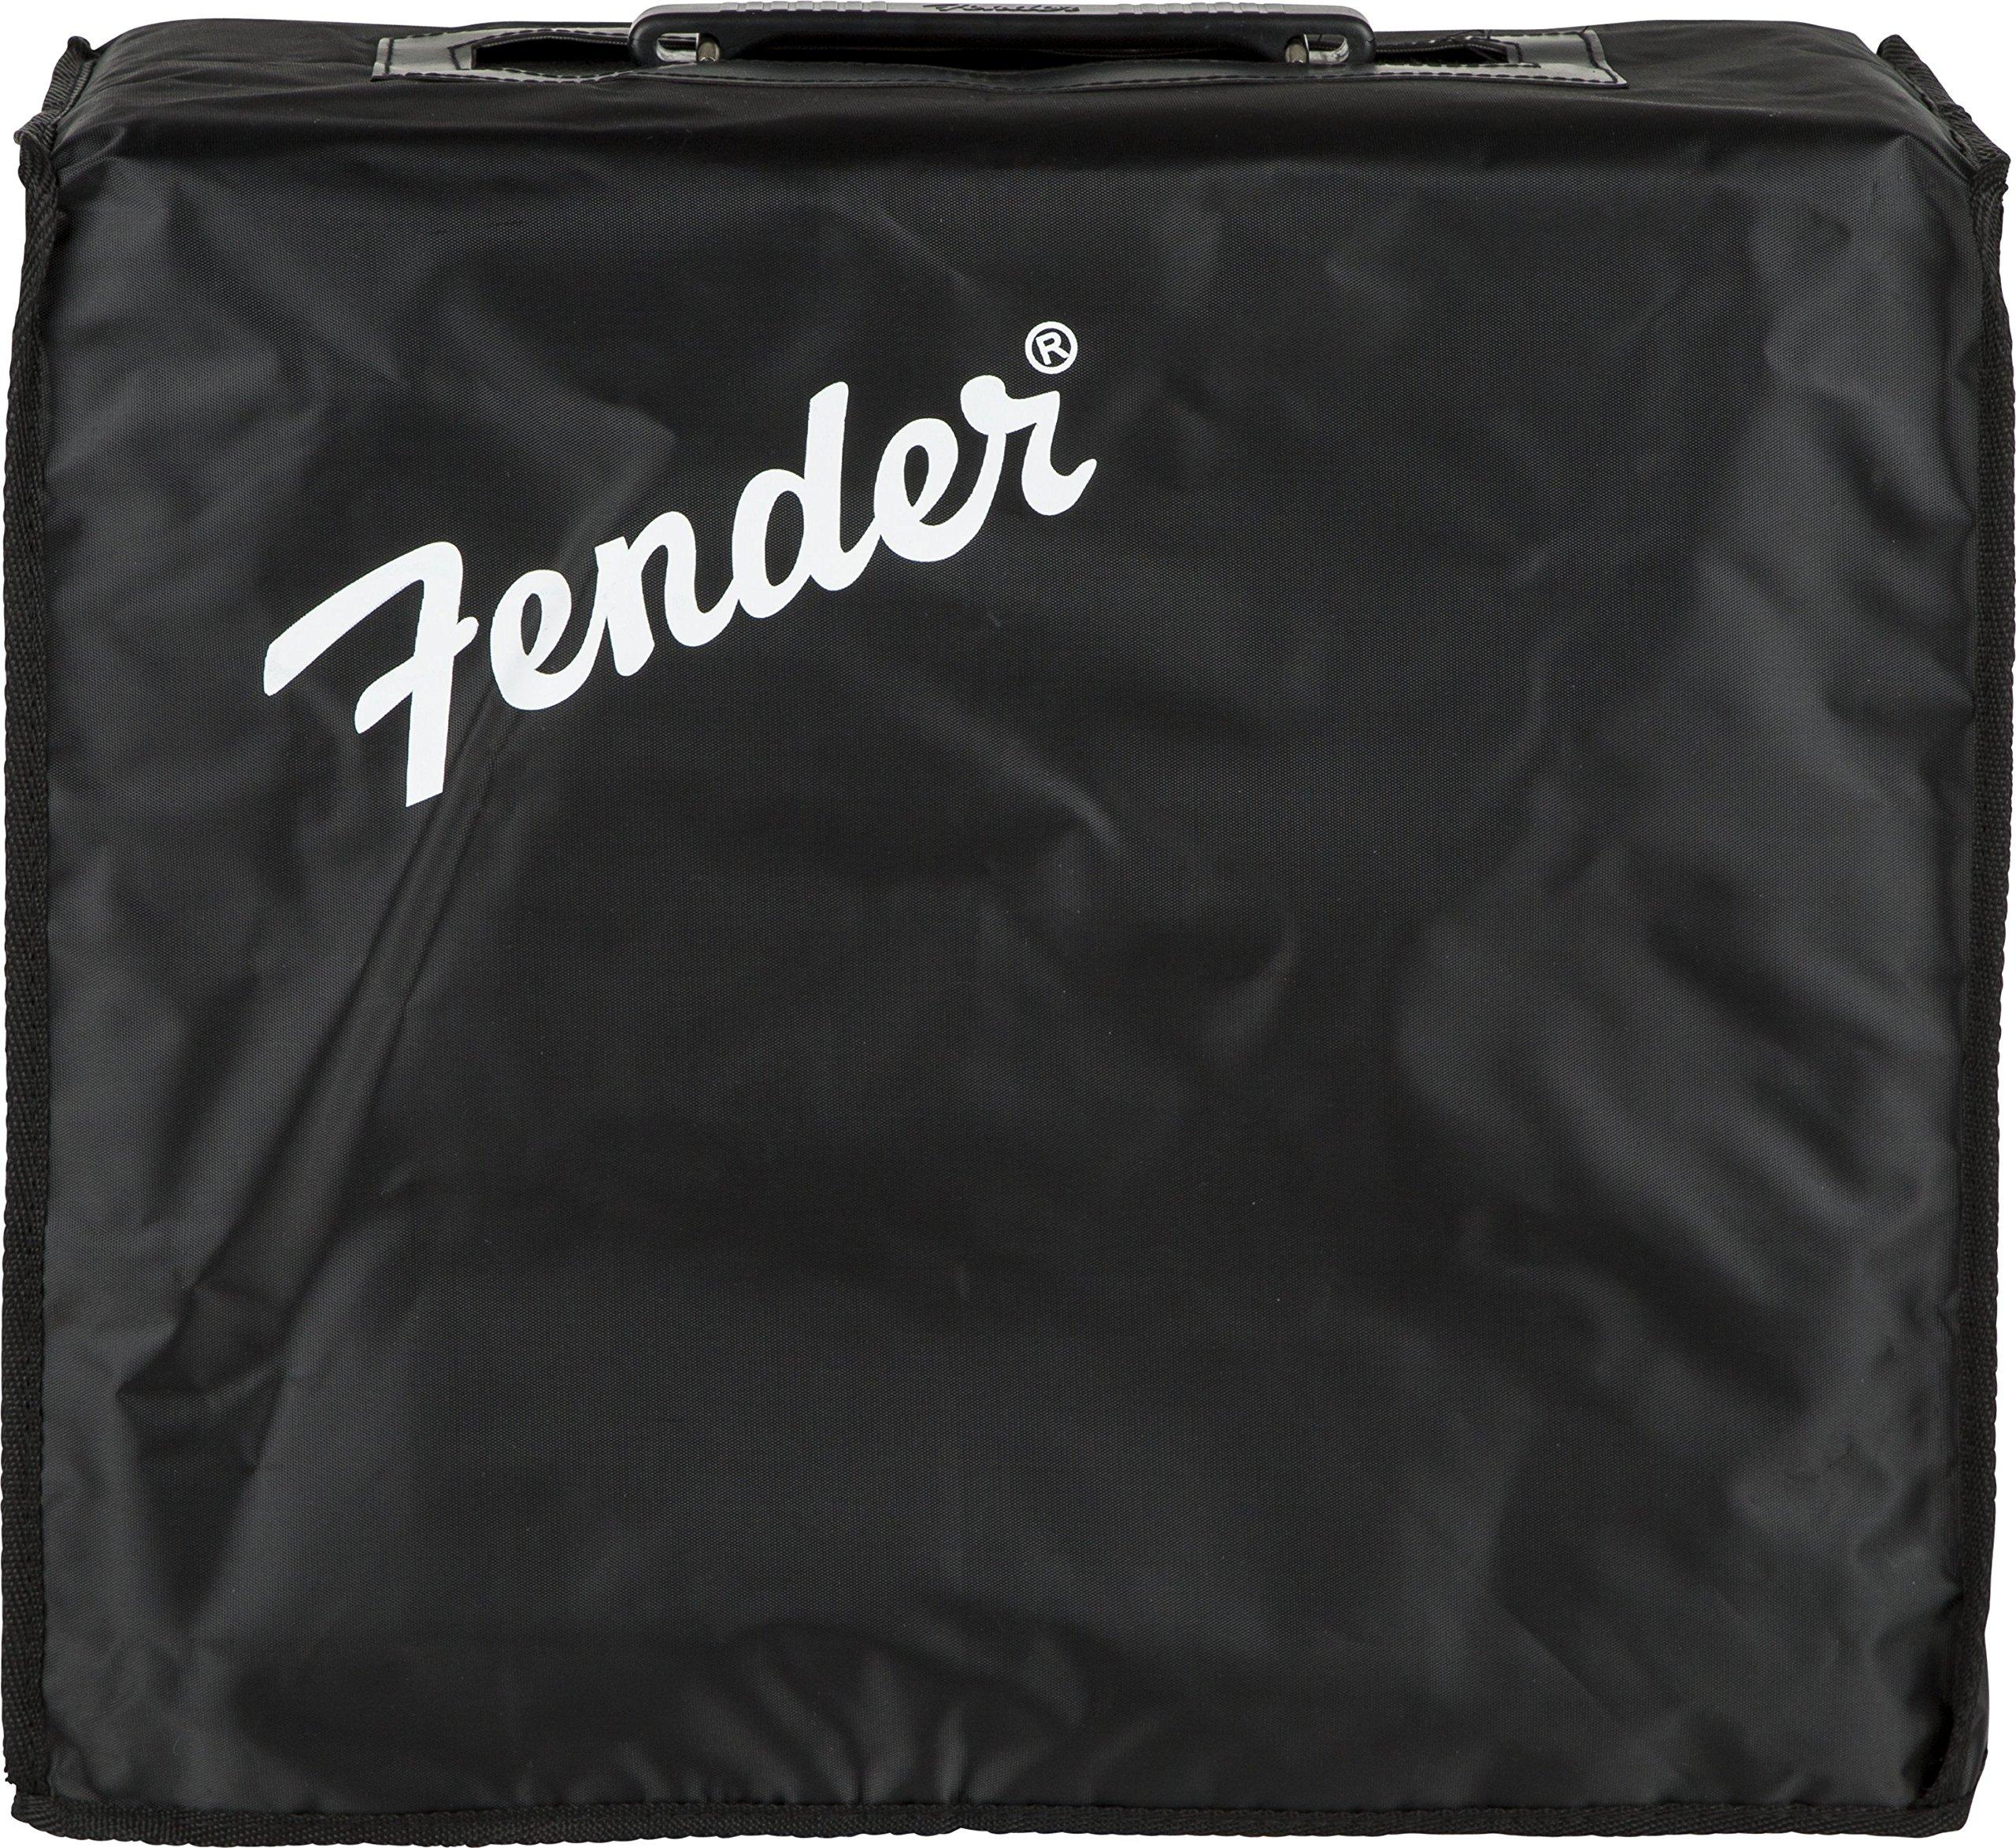 Fender 0054912000 Blues Junior Iii Cover, Black Vinyl by Fender (Image #1)